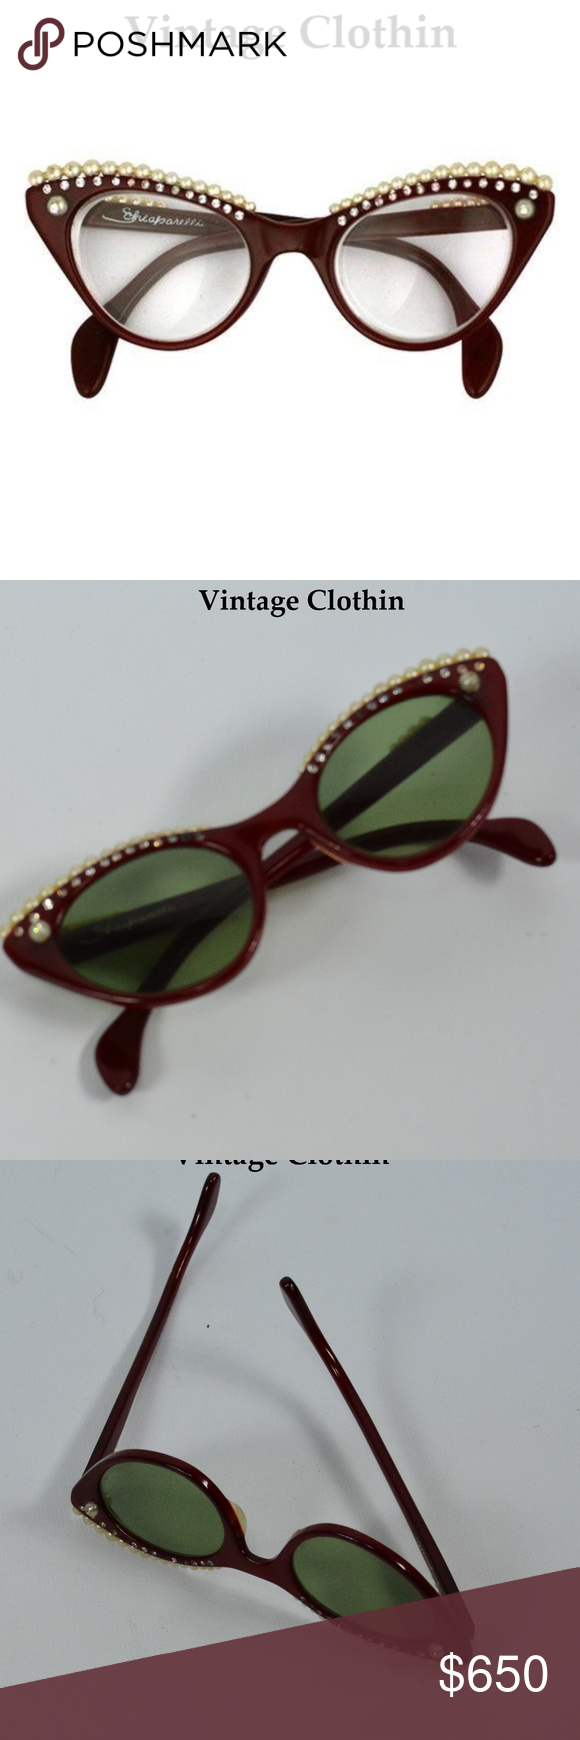 81ef52a939 Vintage 1958 Schiaparelli Cats Eye Sunglasses Rare!! Authentic Iconic 1958  Elsa Schiaparelli Lunettes Cats